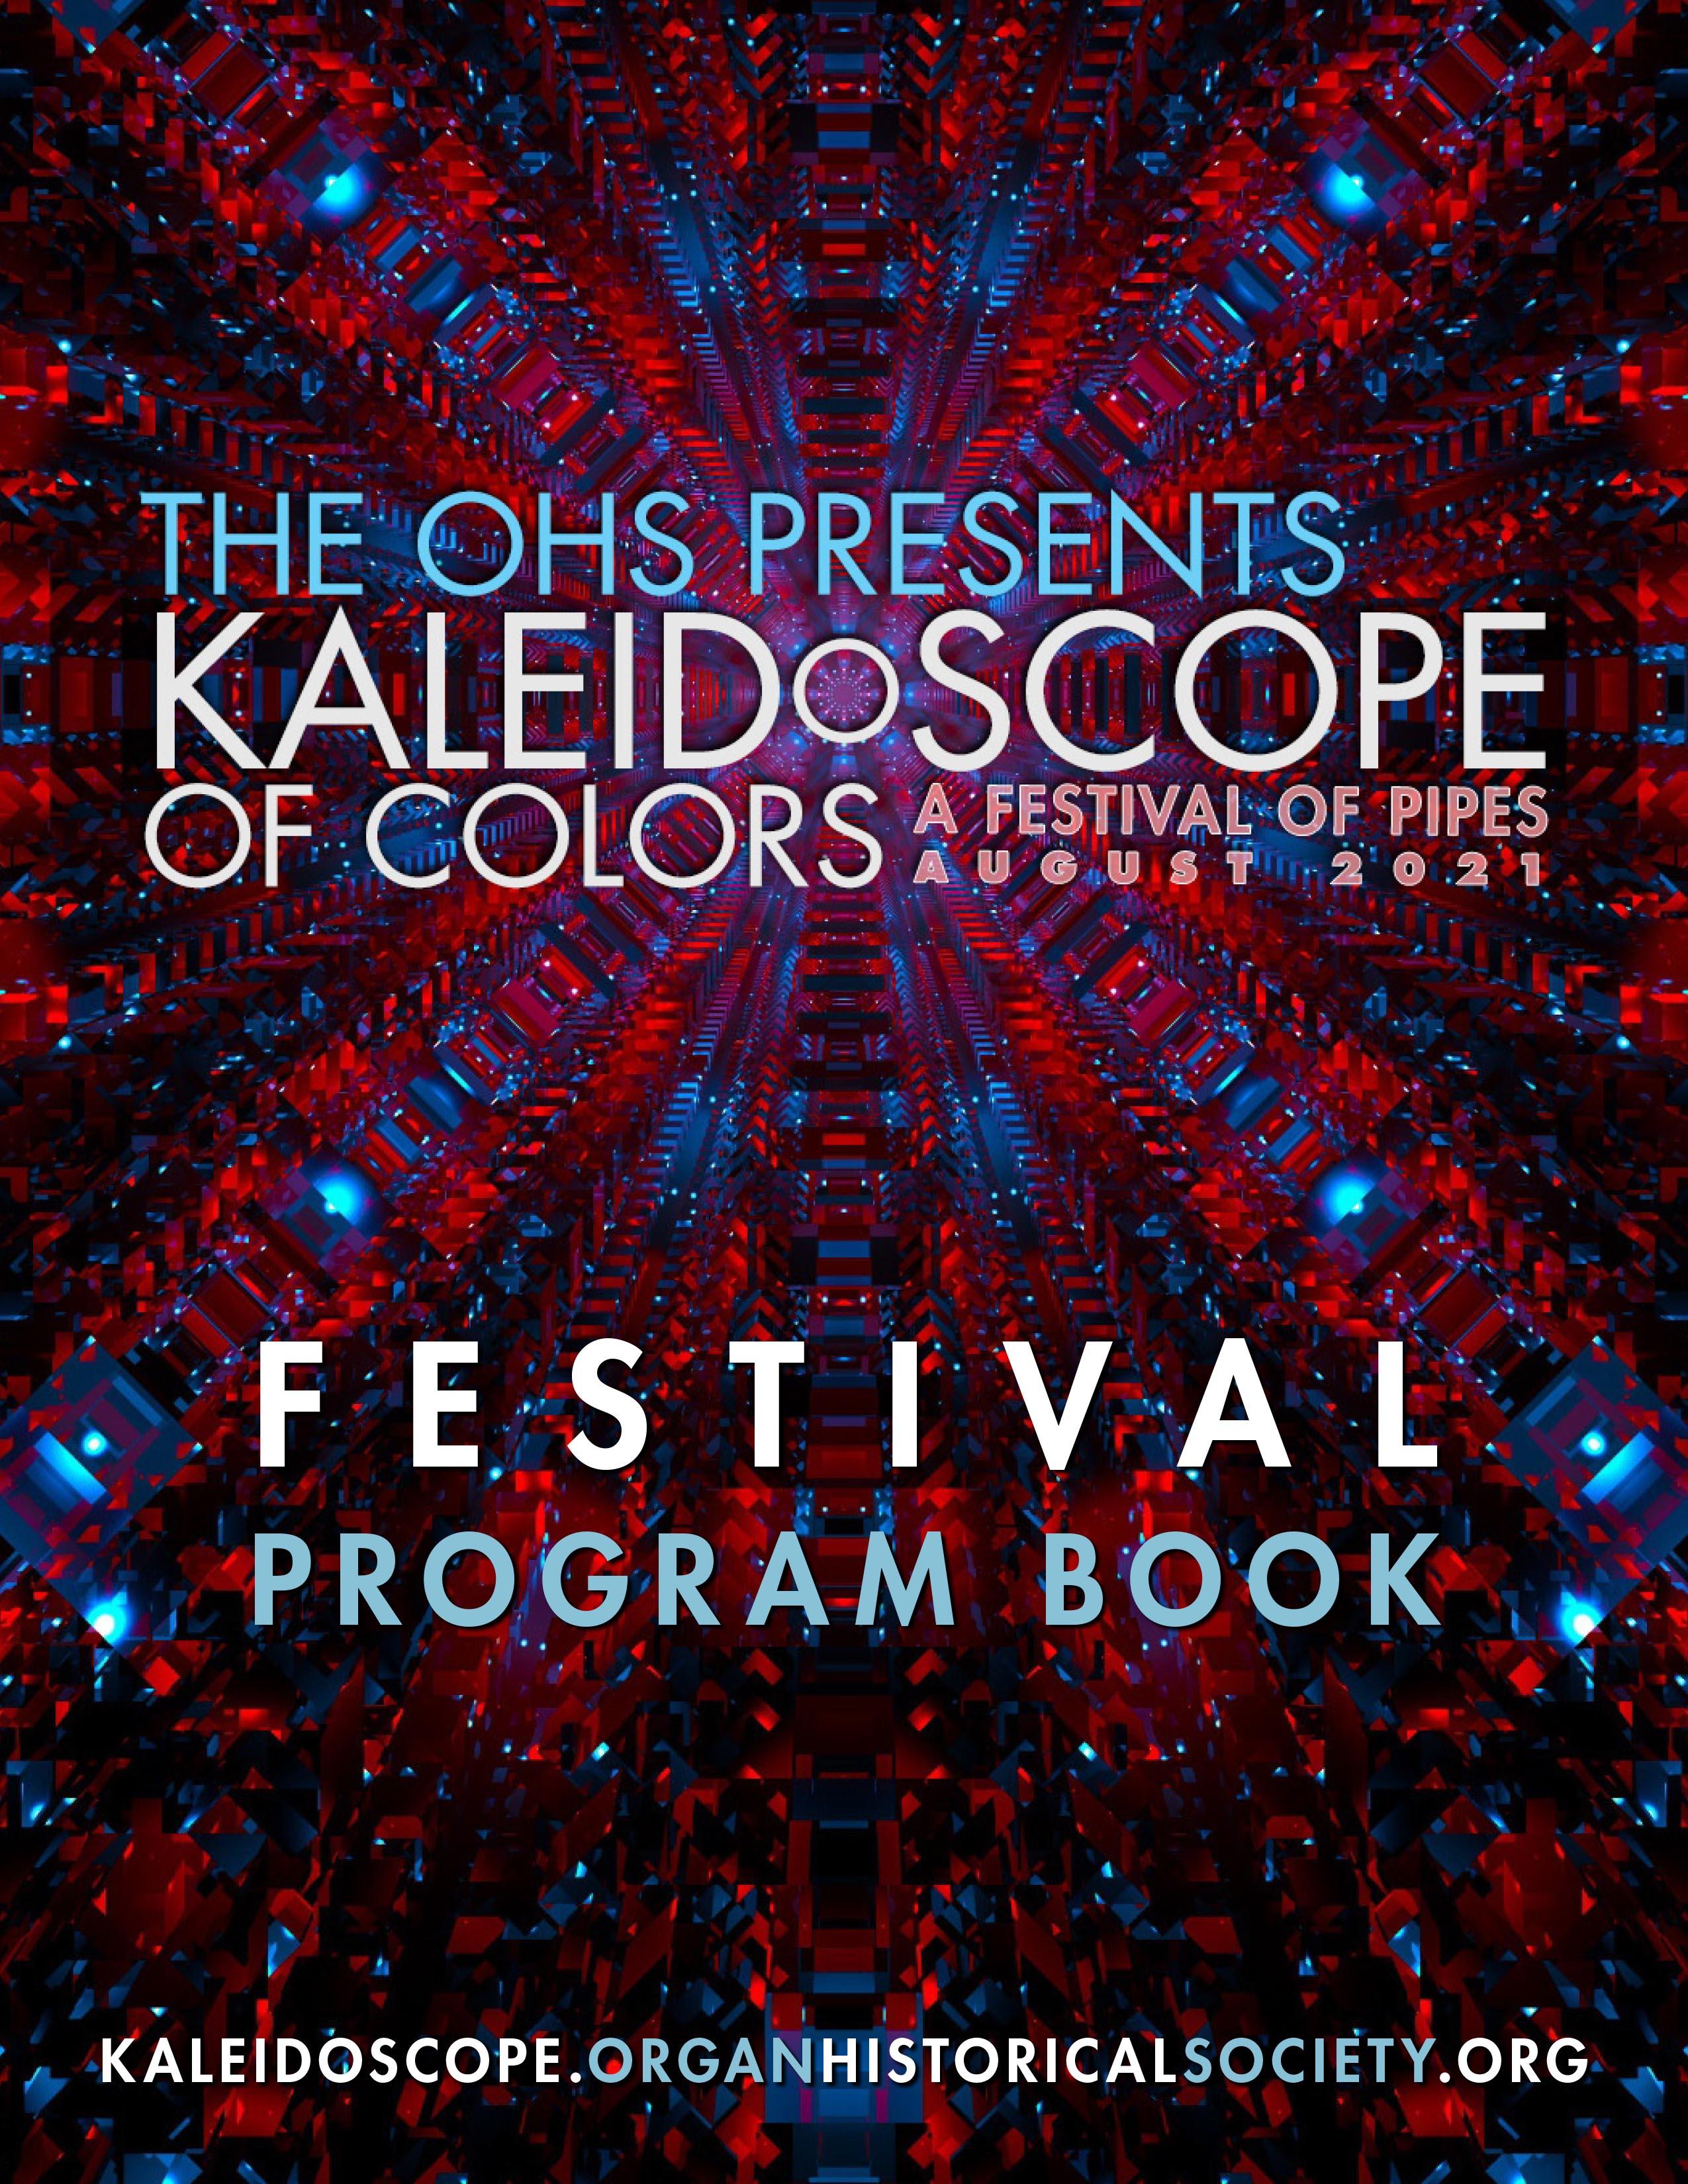 KALEIDOSCOPE OF COLORS - festival program book